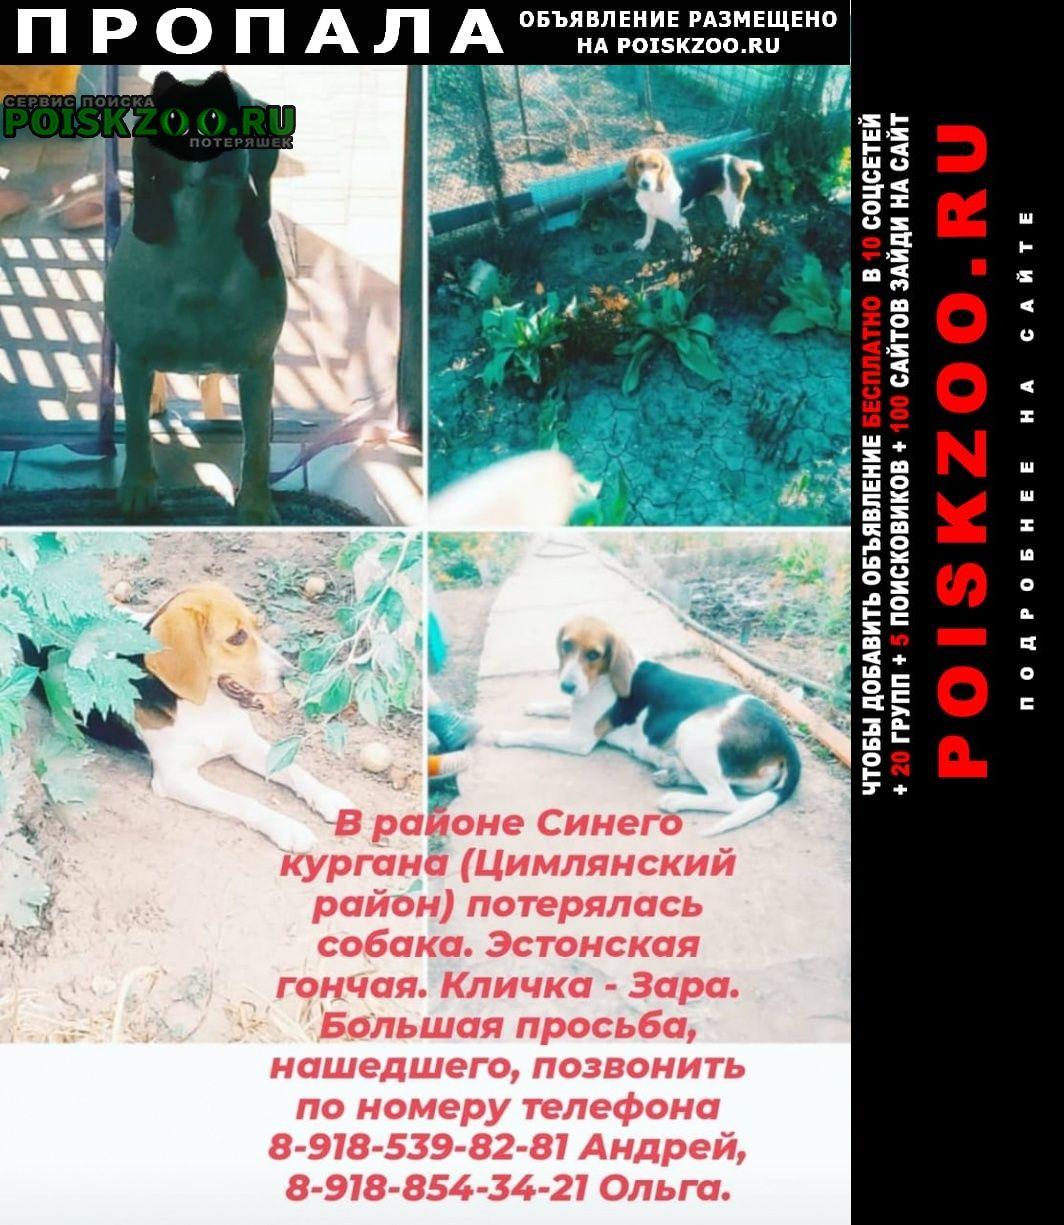 Пропала собака Цимлянск